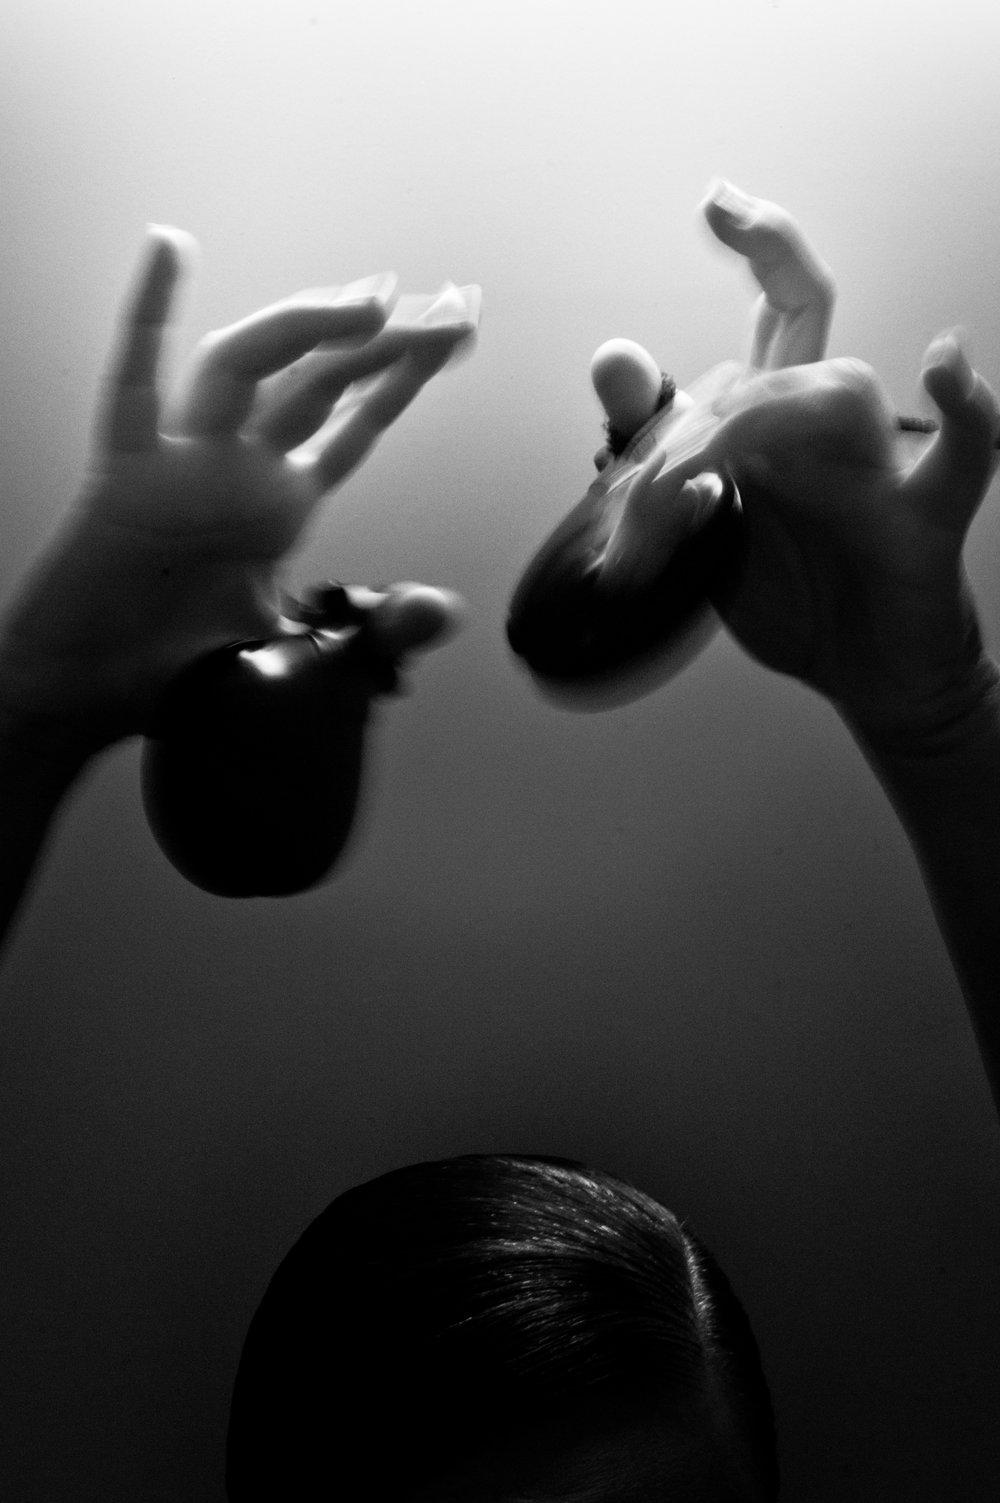 Flamenco_hands.jpg